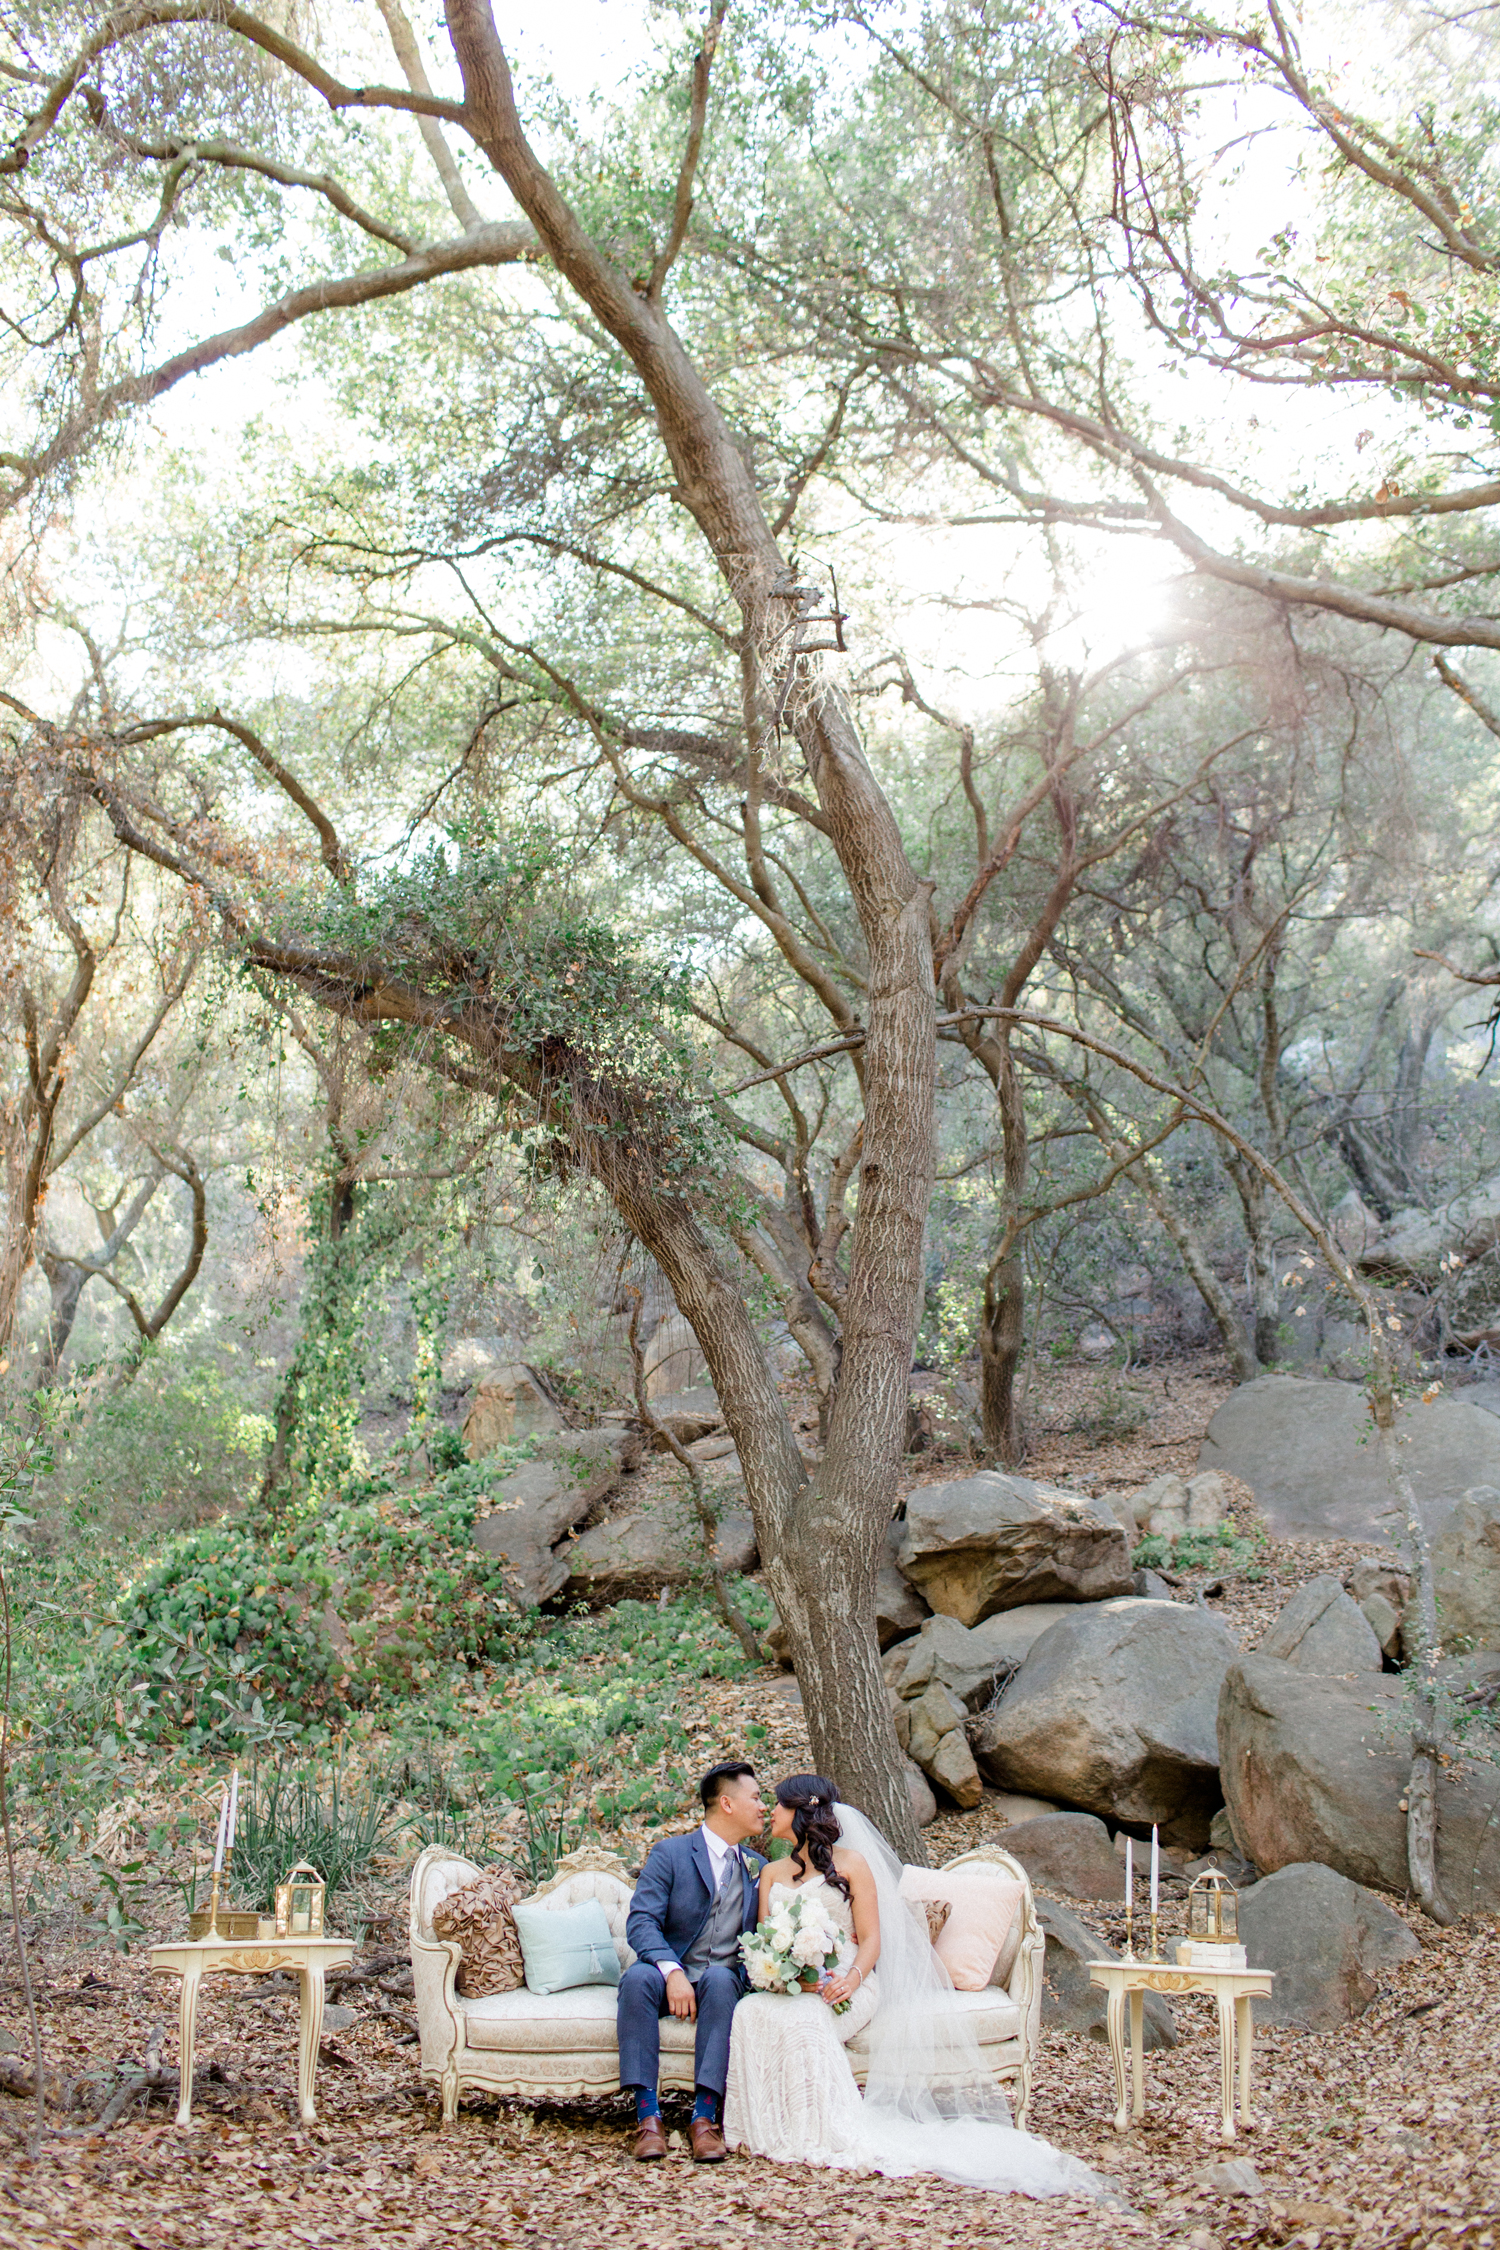 thevondys.com | Secluded Garden Estate Temecula Wedding | Los Angeles California Wedding Photography | The Vondys